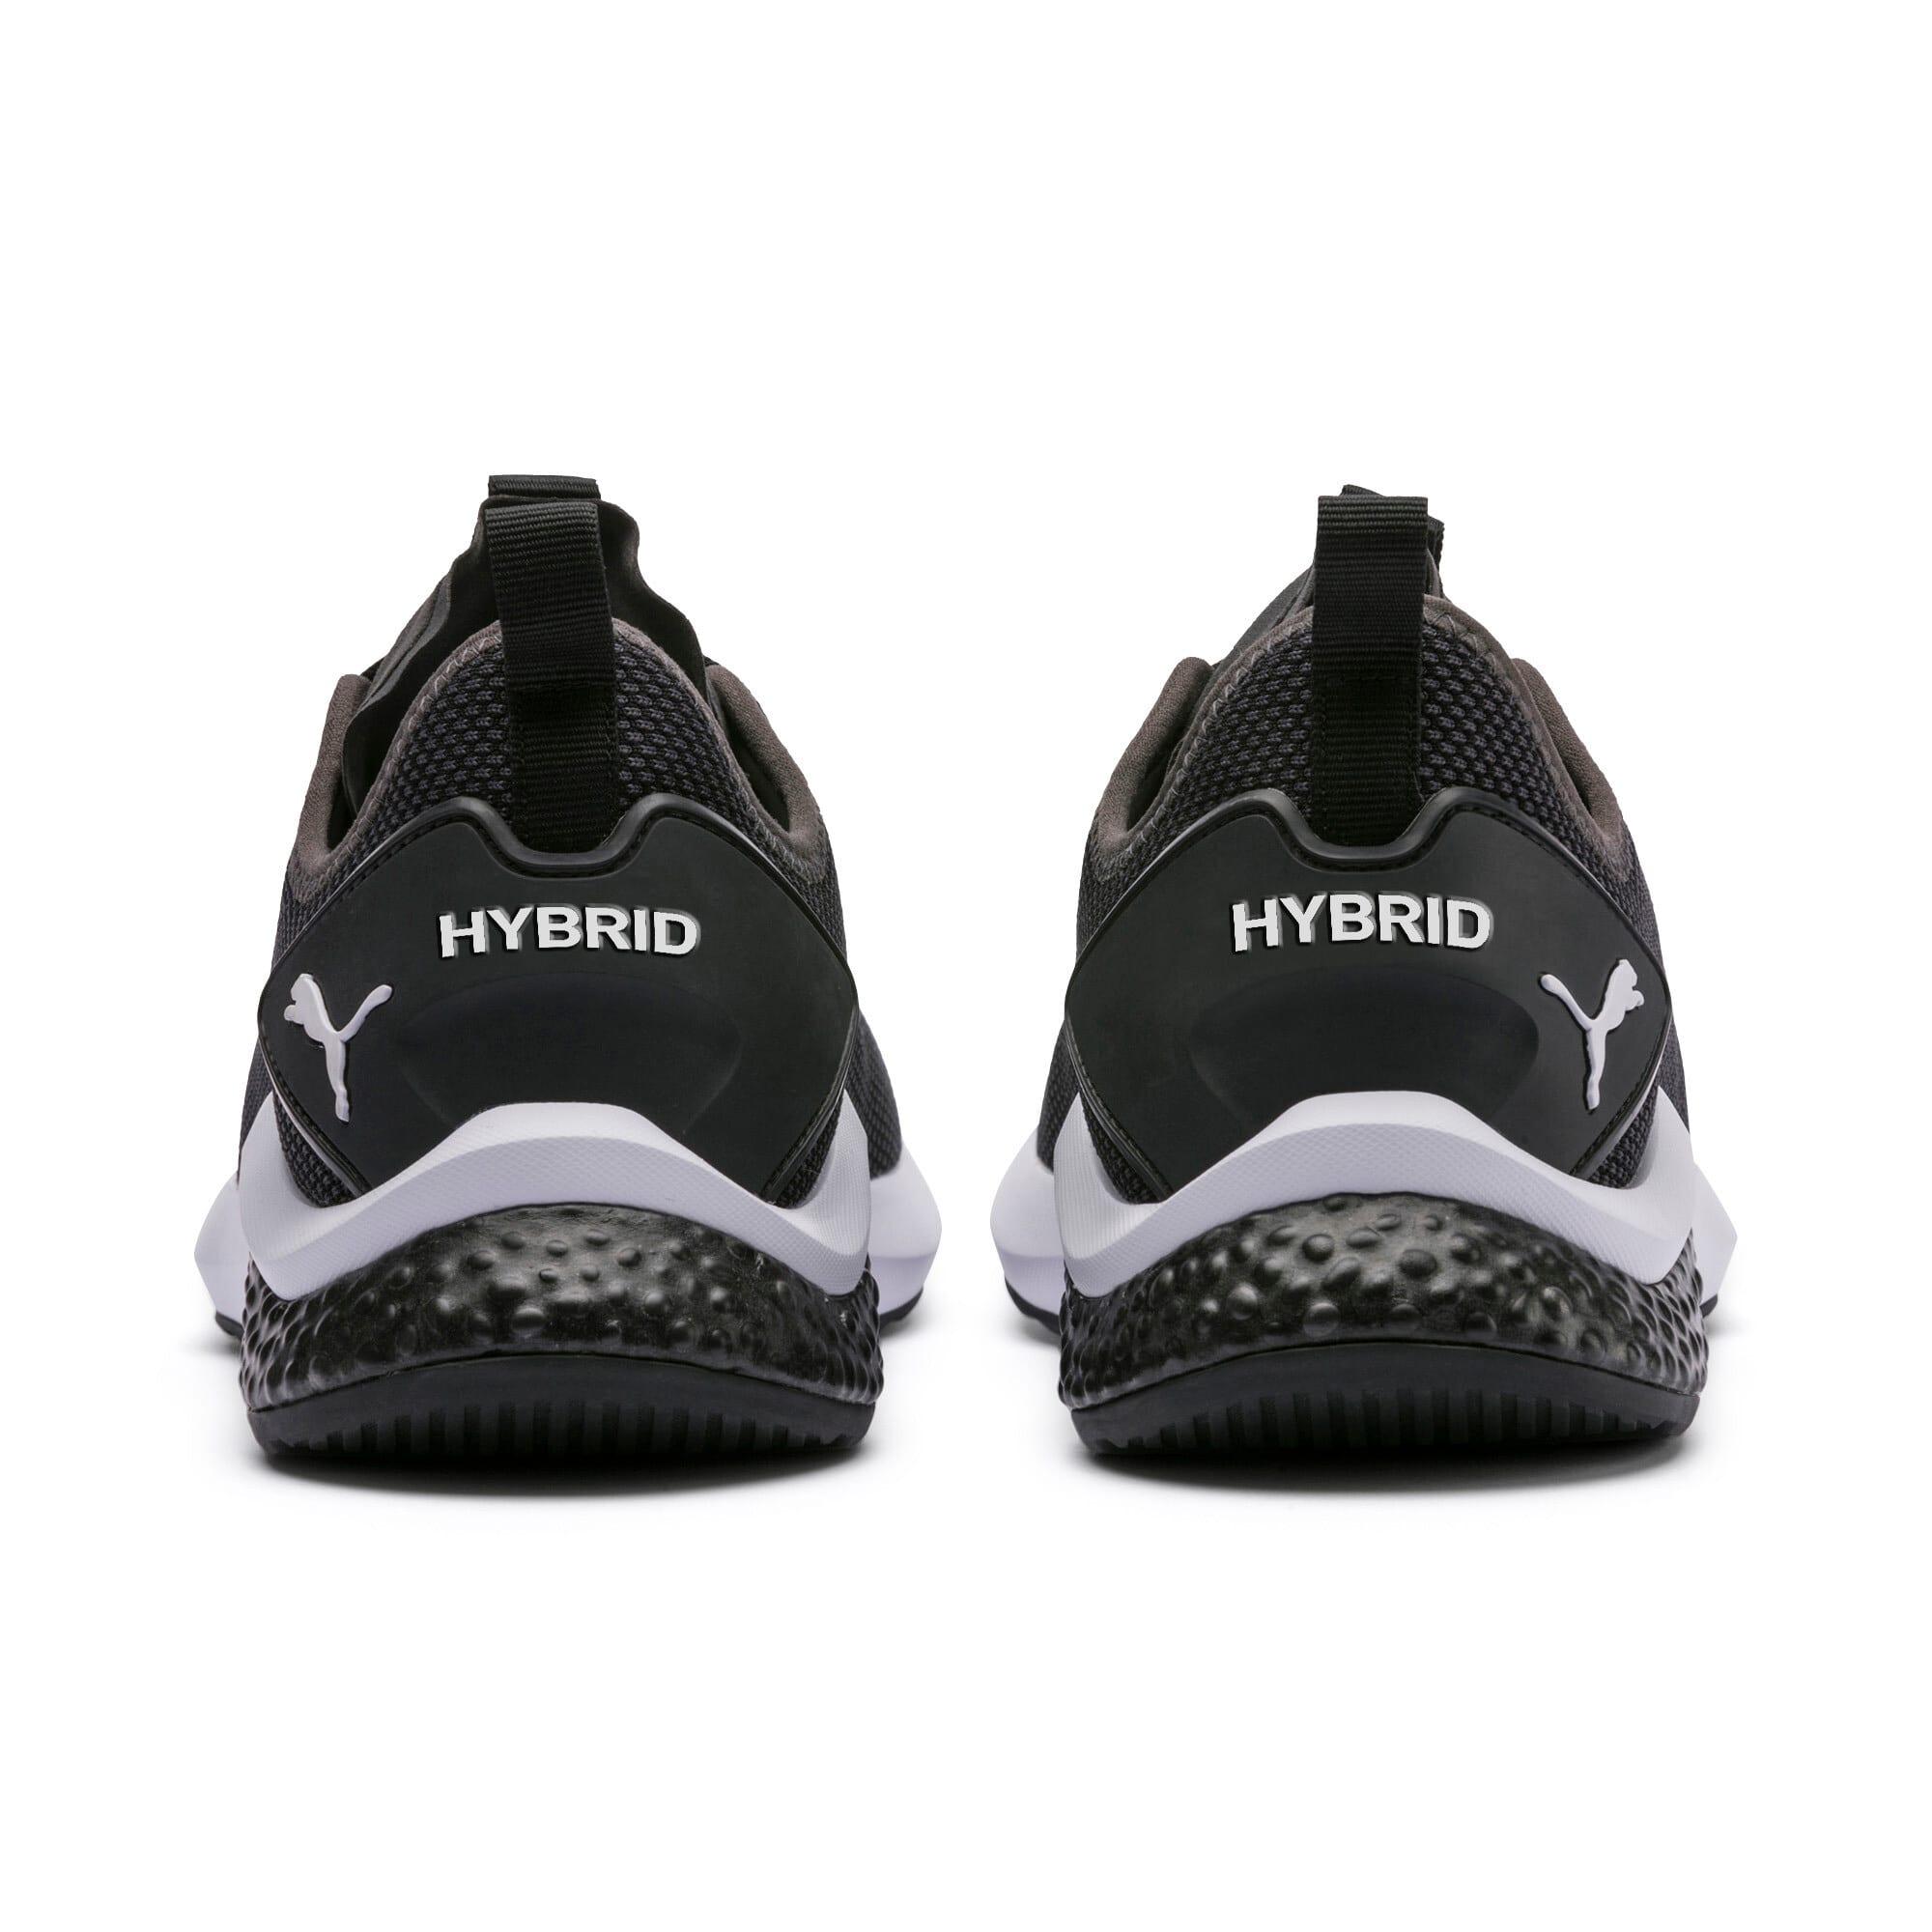 Thumbnail 4 of HYBRID NX Men's Running Shoes, Puma Black-Puma White, medium